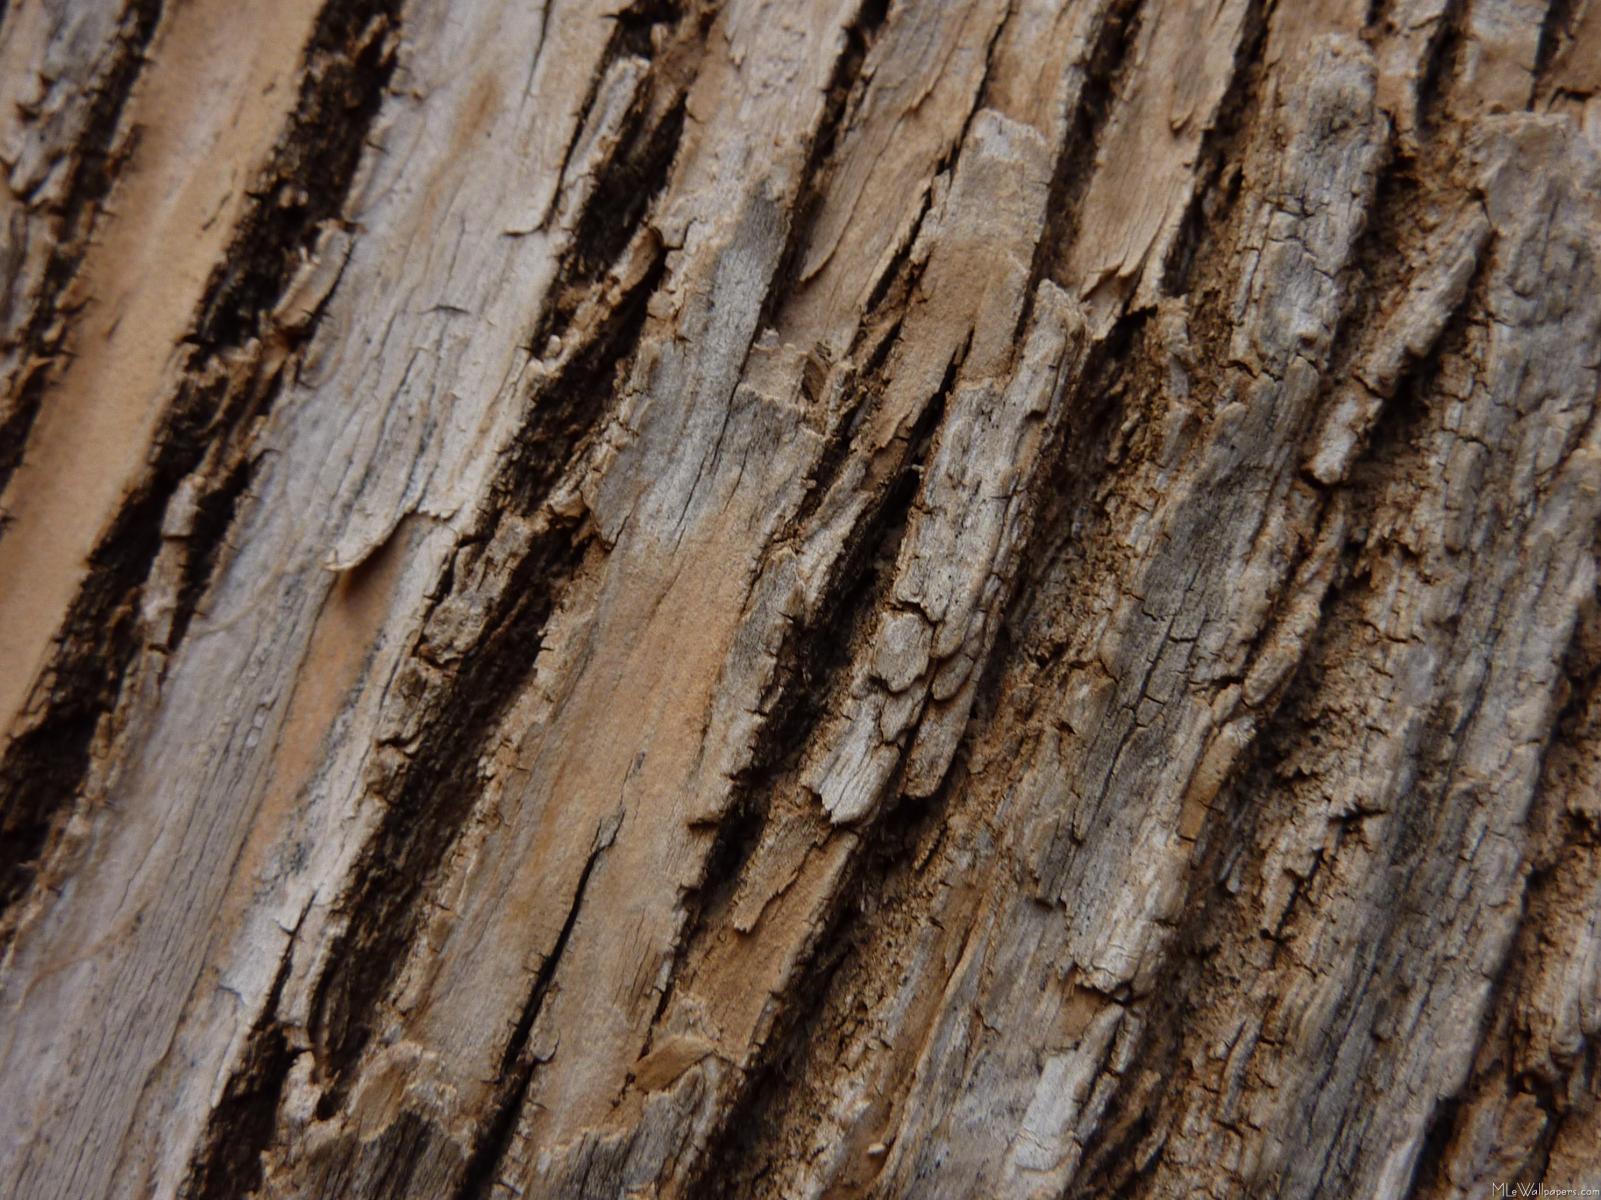 MLeWallpapers.com - Tree Bark I